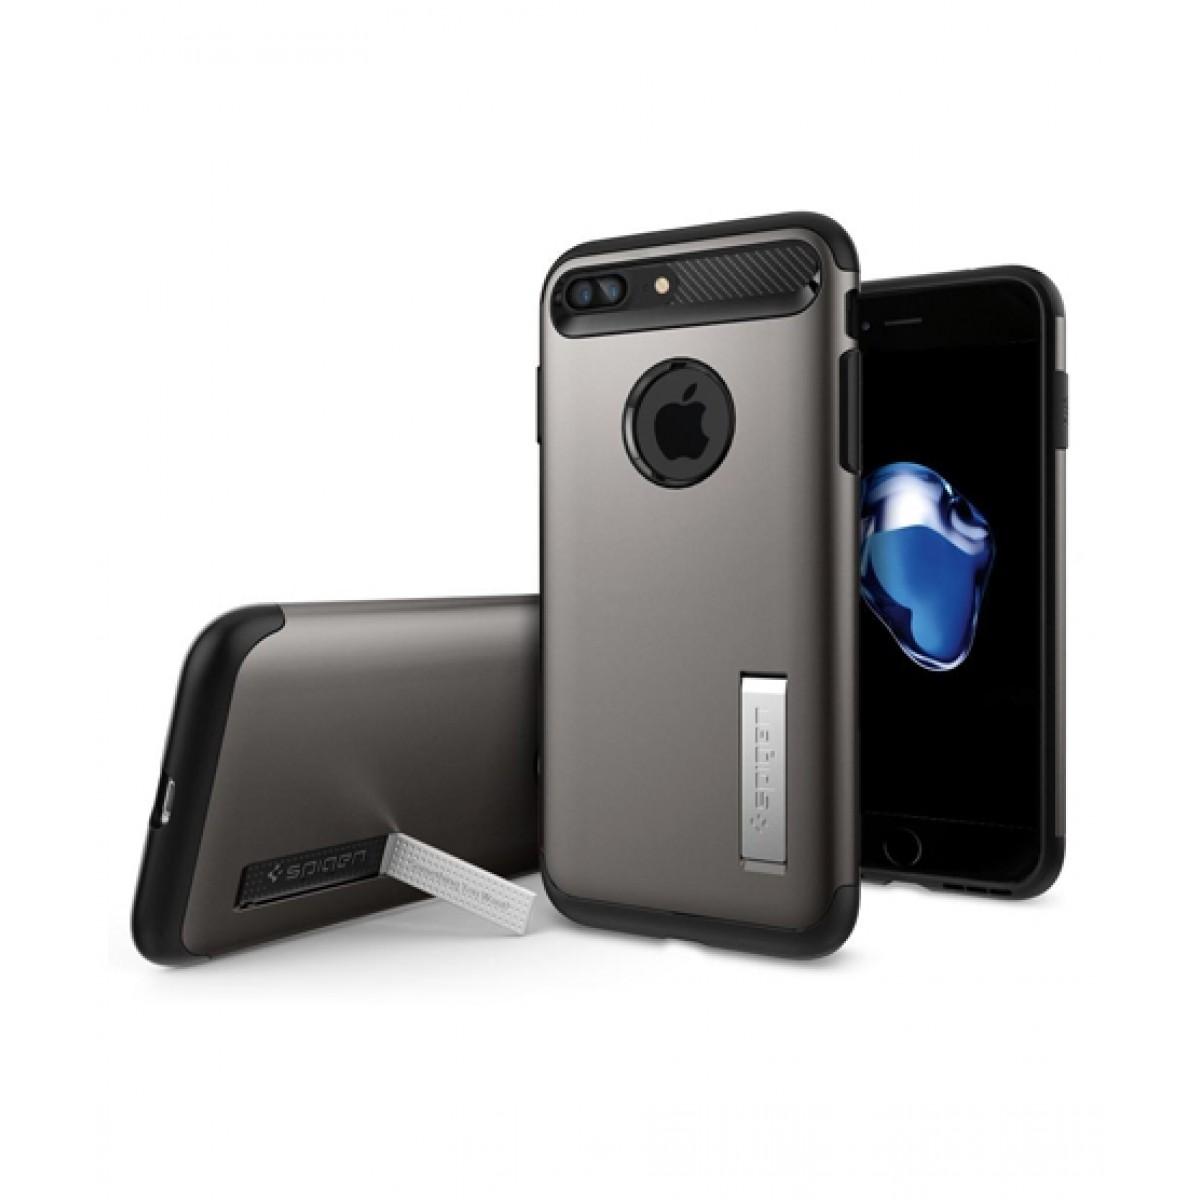 competitive price 0798a d09a8 Spigen Slim Armor Gunmetal Case For iPhone 8 Plus